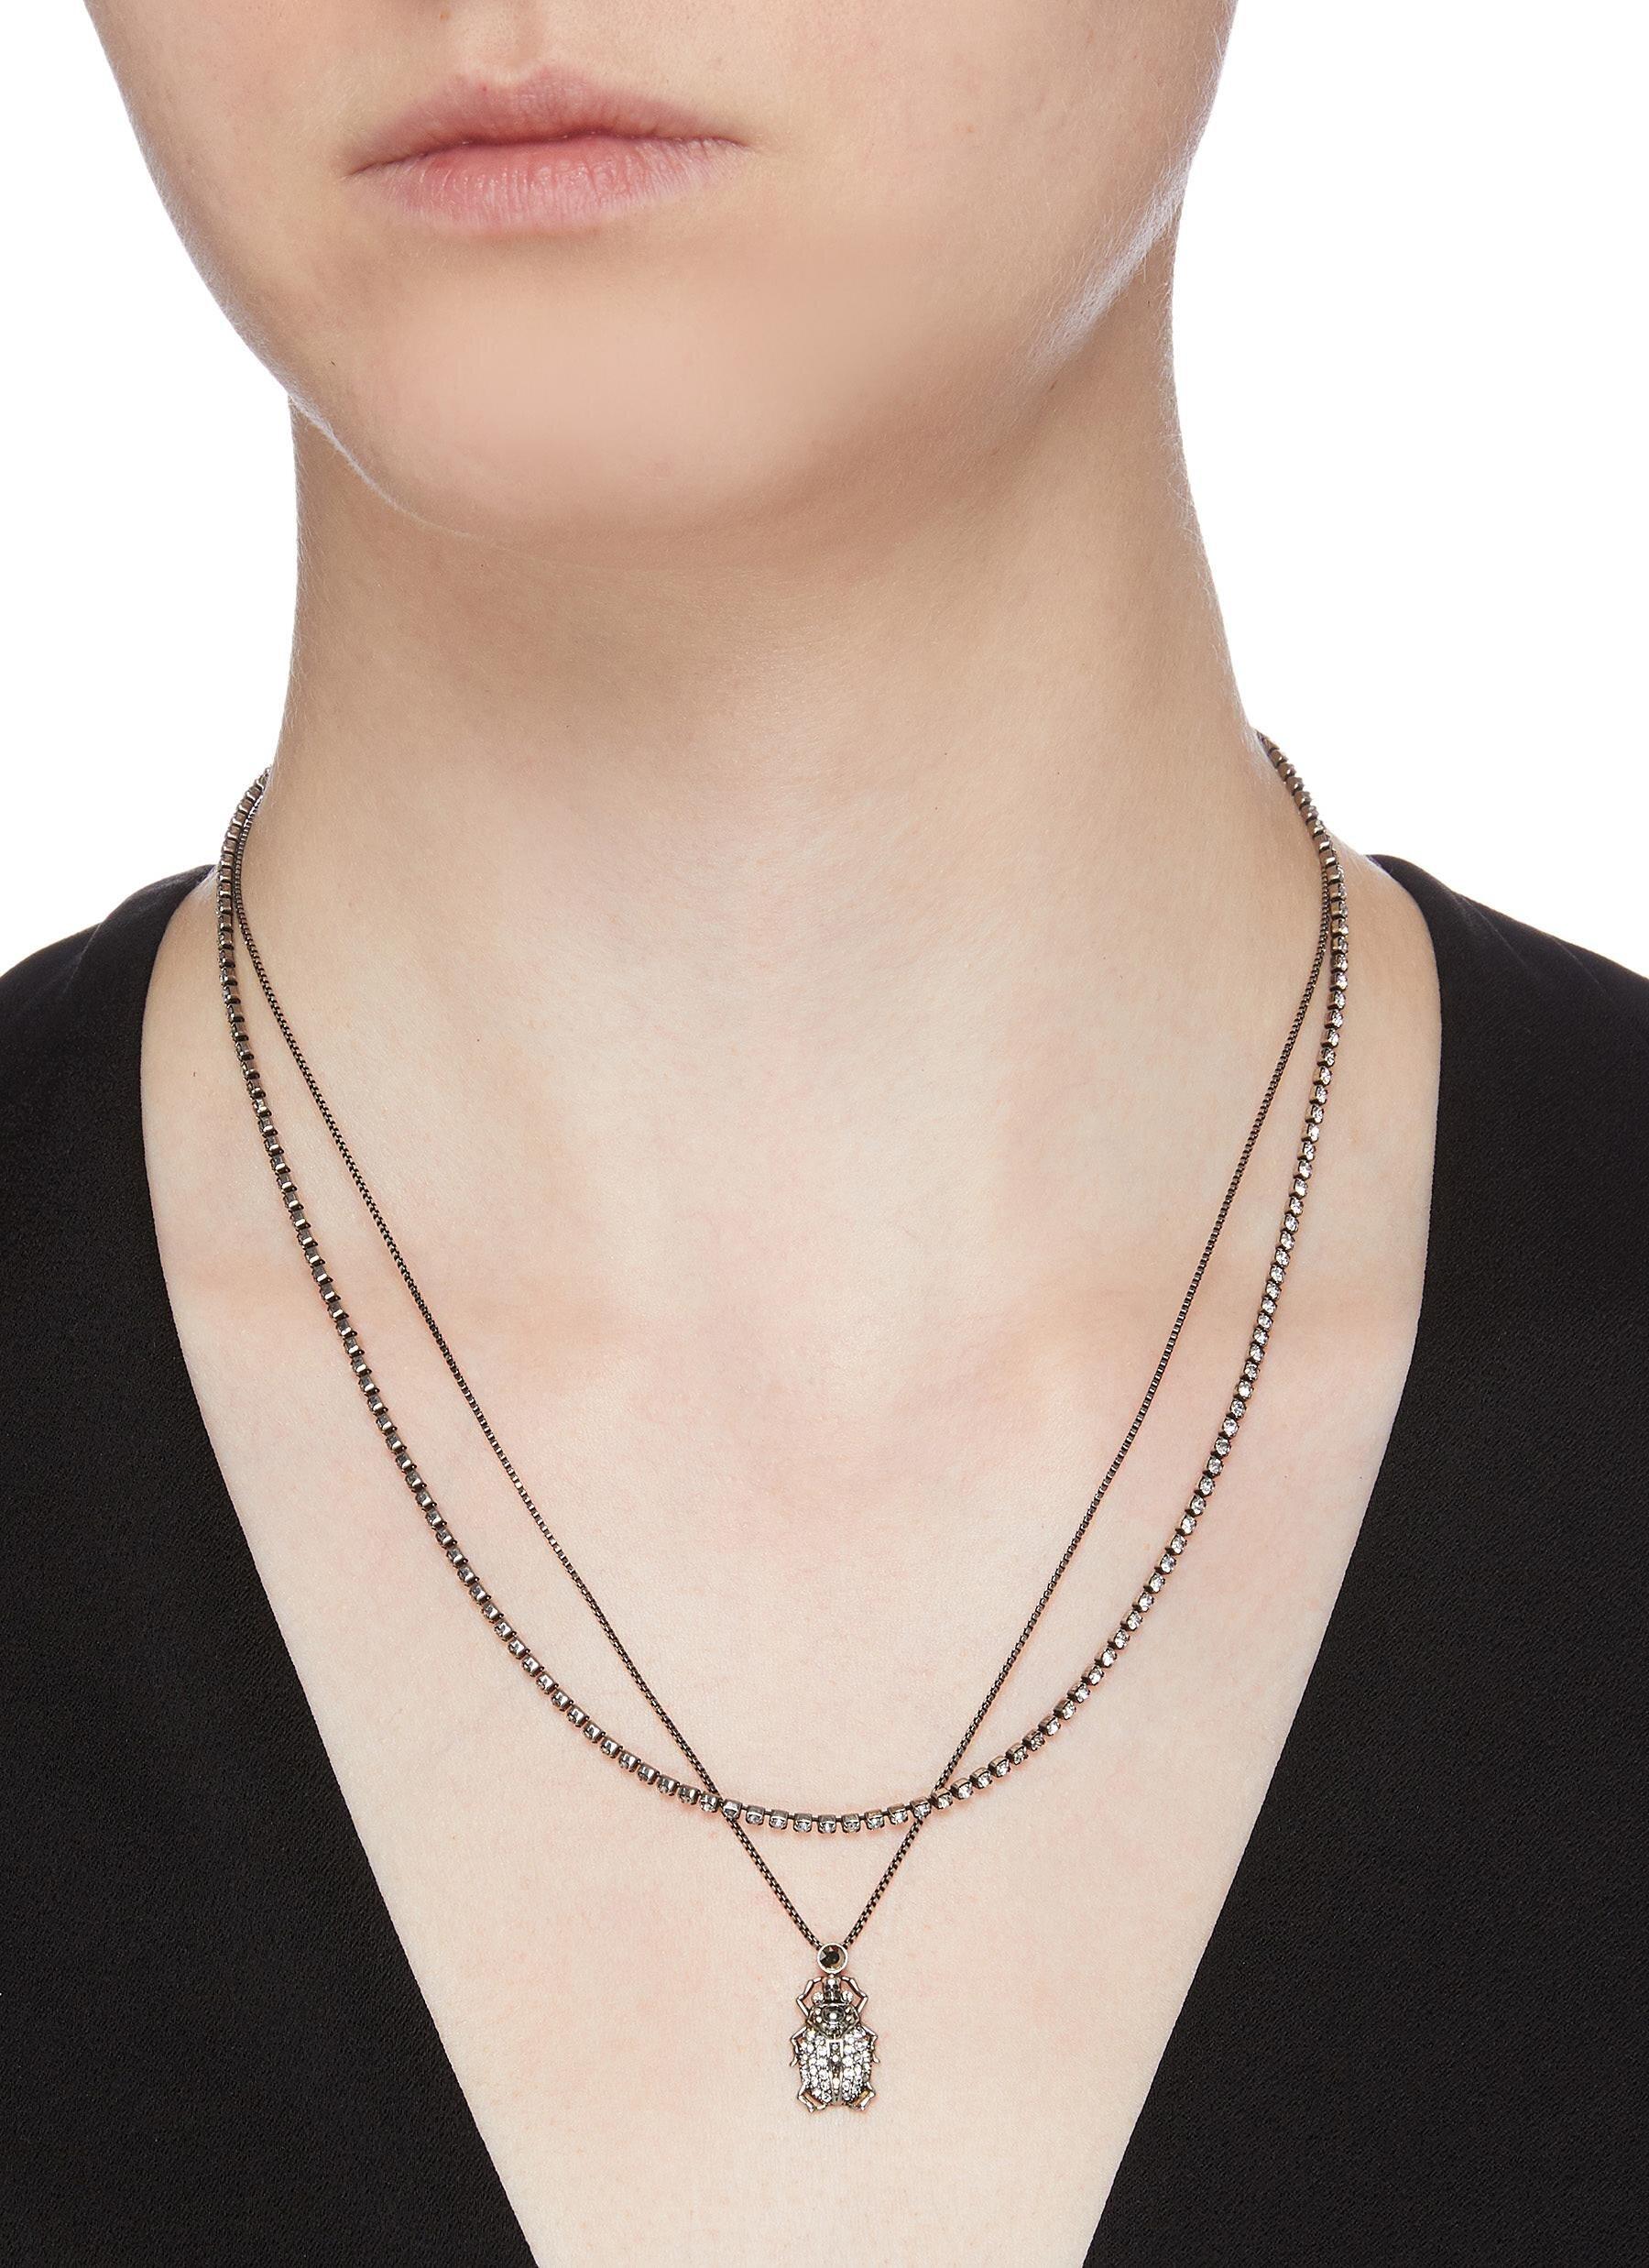 Alexander Mcqueen Swarovski Crystal Pavé Beetle Double Chain Necklace  HKD$4,000